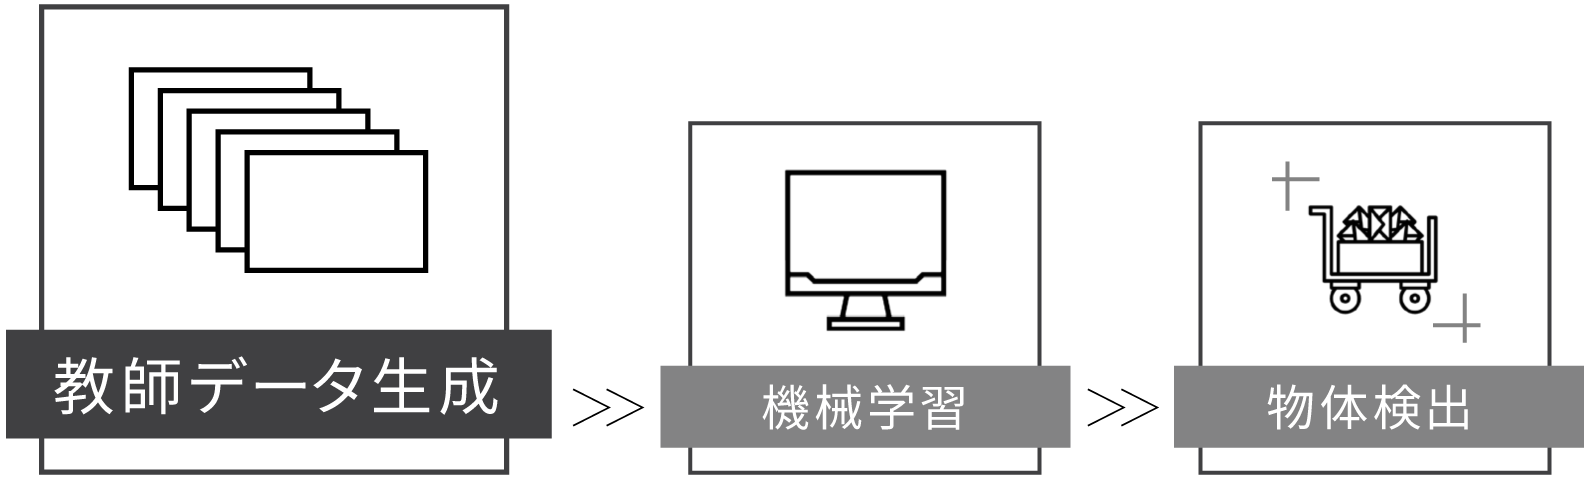 AI-Feed 画像